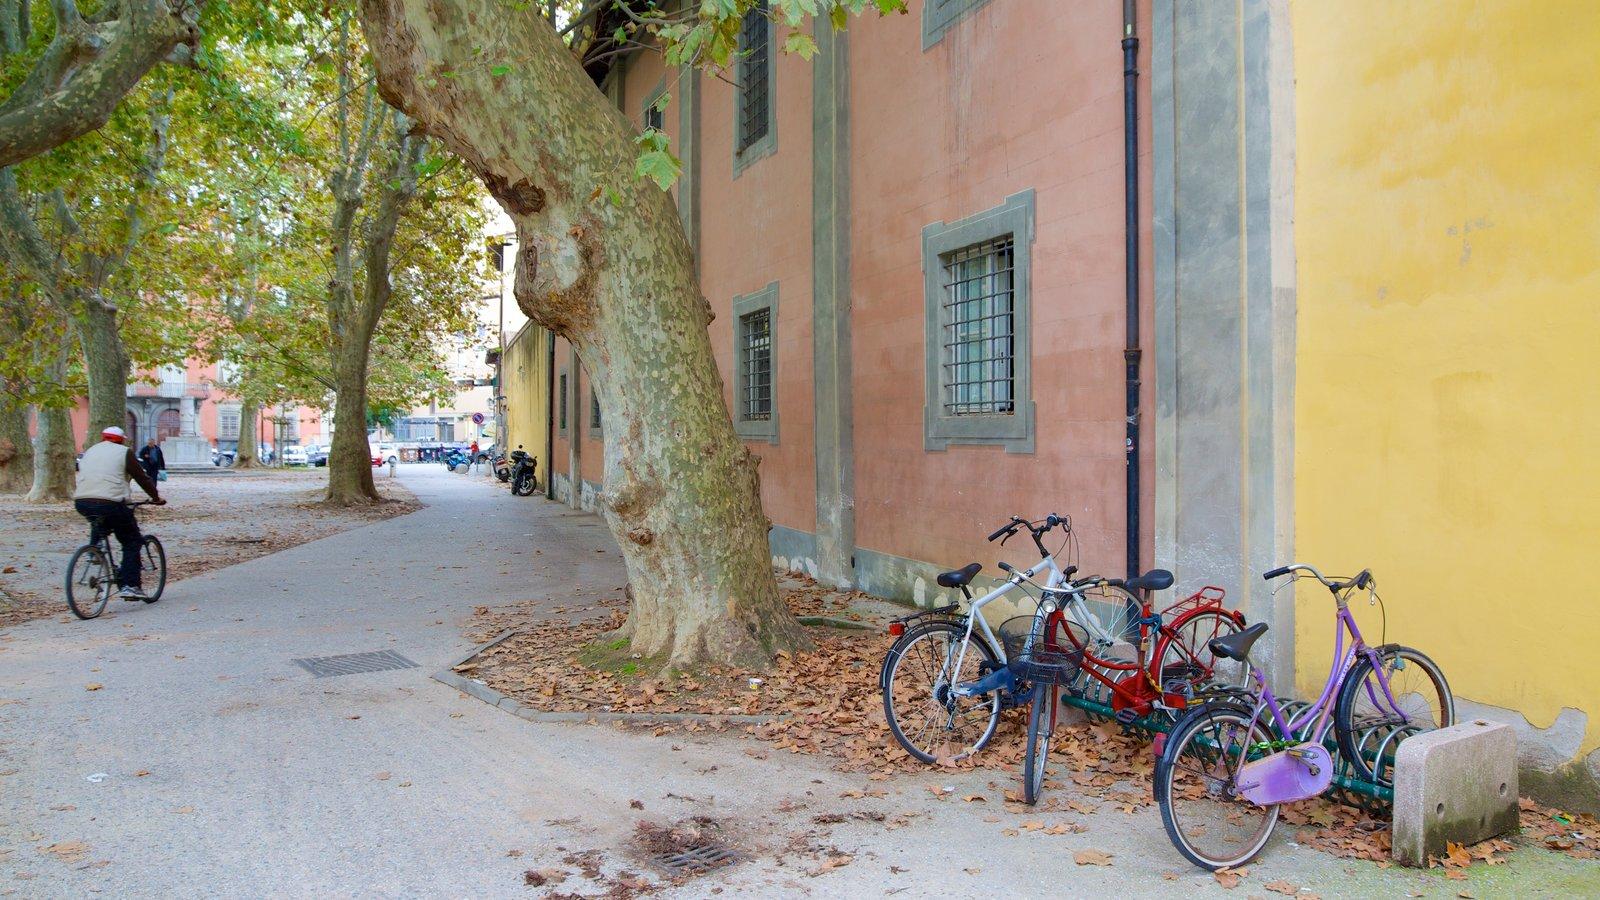 Pisa caracterizando ciclismo e cores do outono